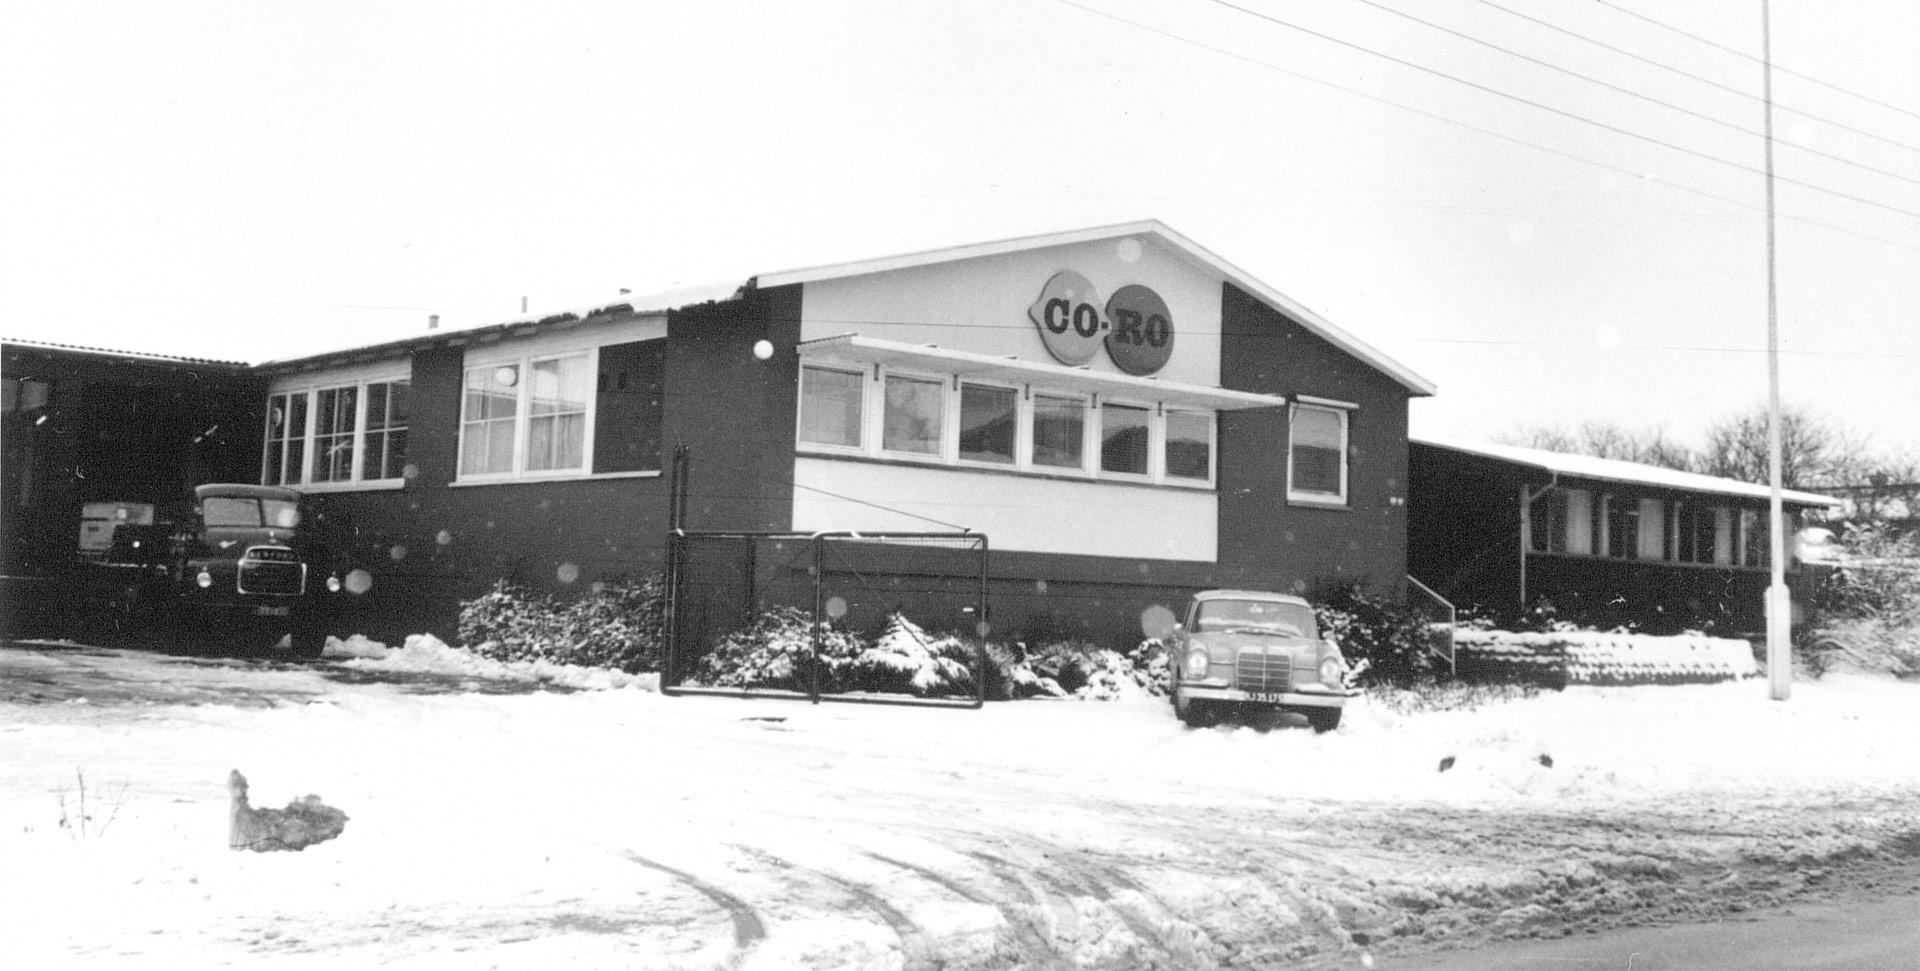 1920x971_ourcompany-heritage_coro_factory.jpg